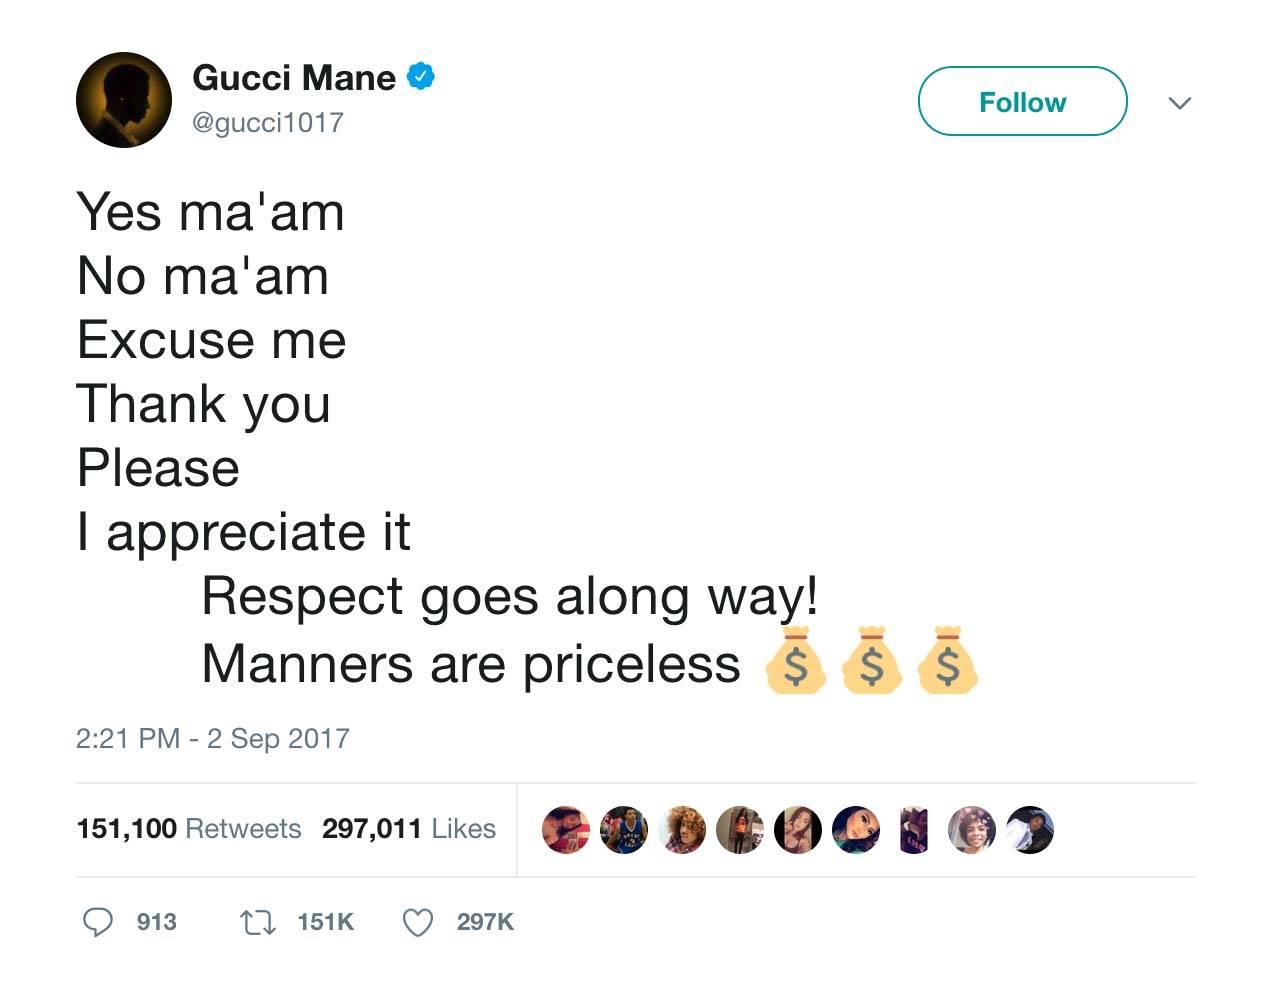 Manners Matter - (Photo: Gucci Mane via Twitter)